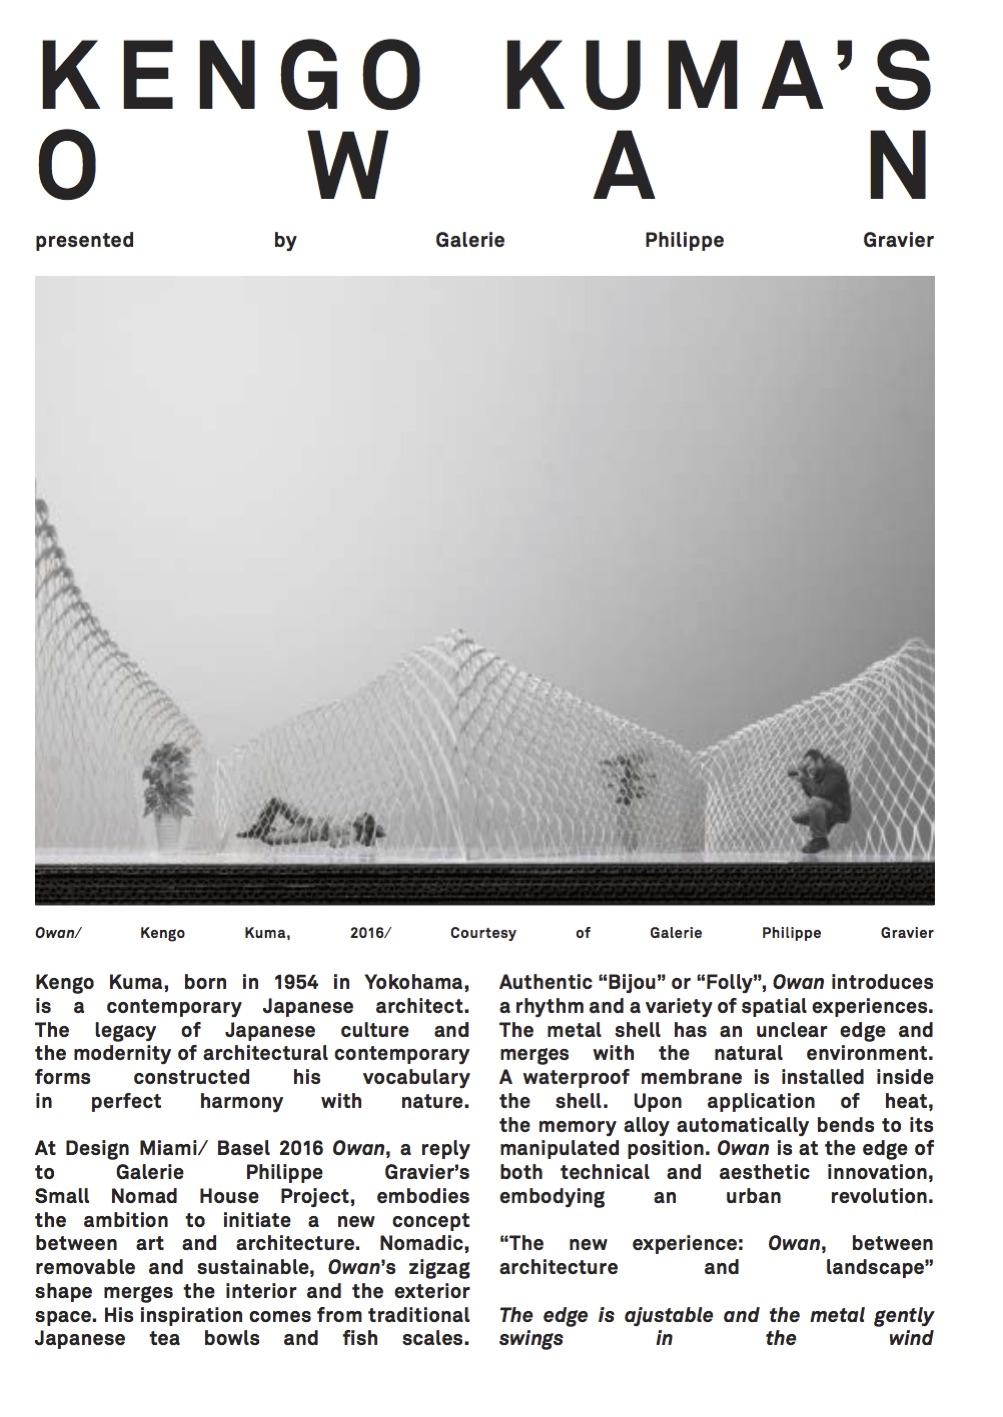 Design Miami / Basel – At Large 2016